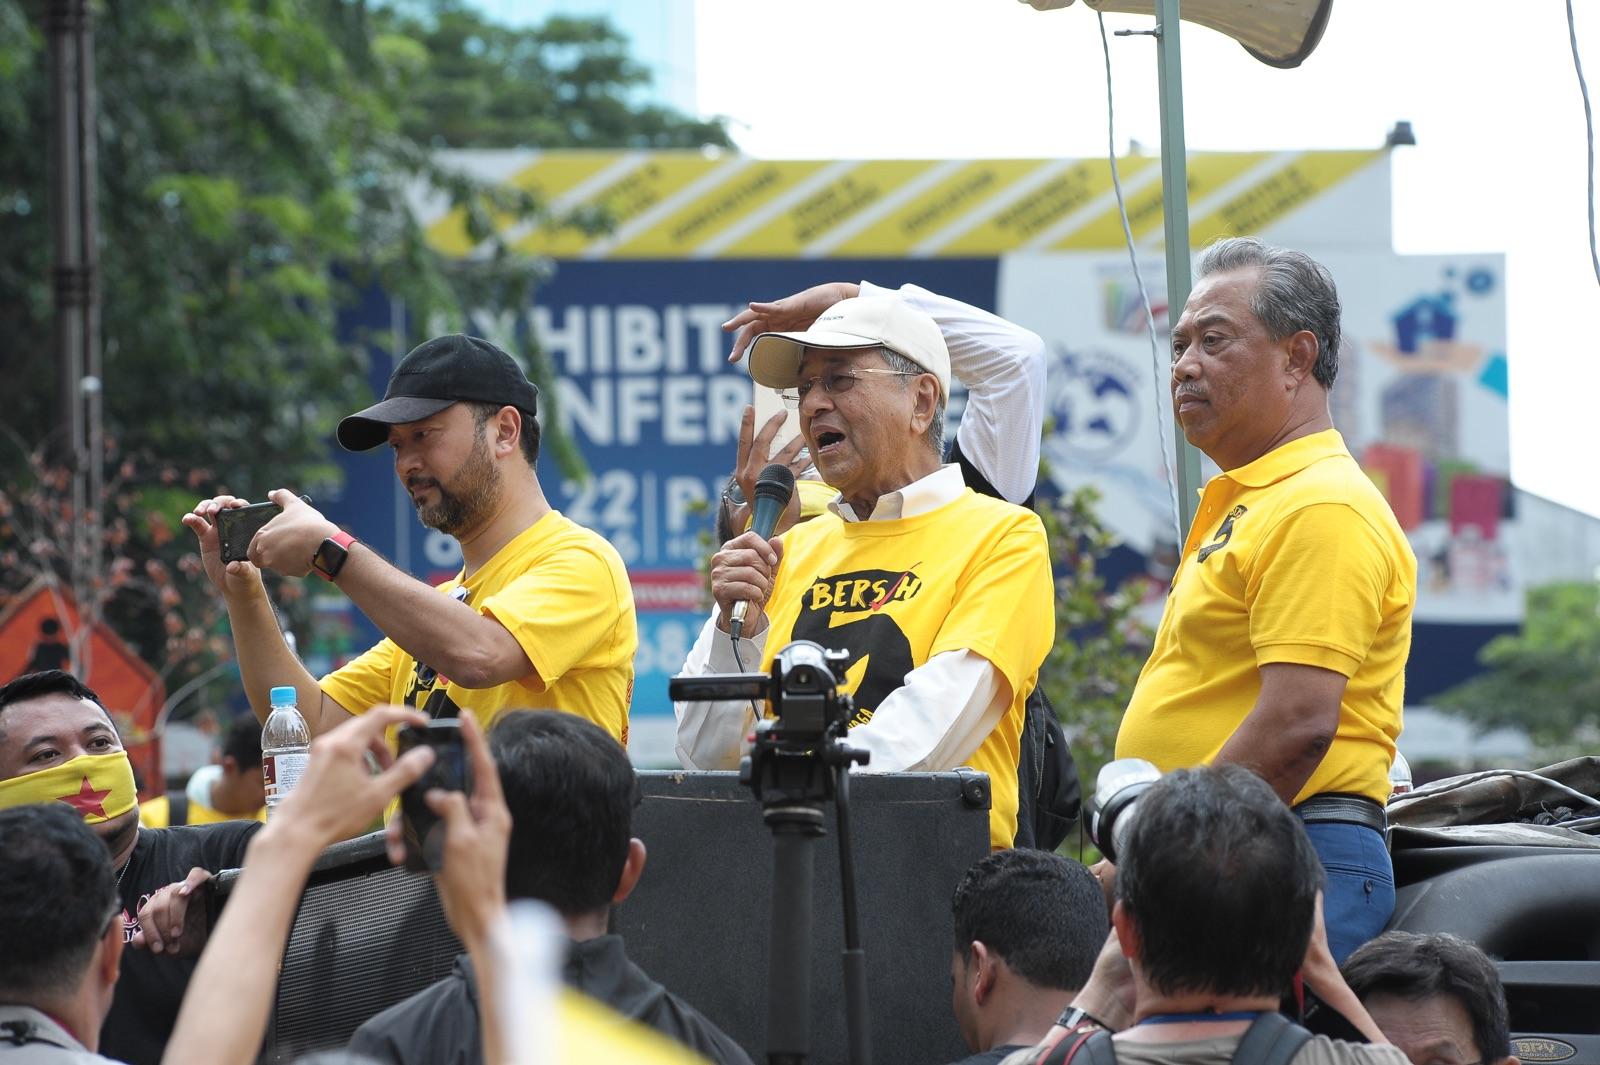 Mahathir Mohamad - New Naratif